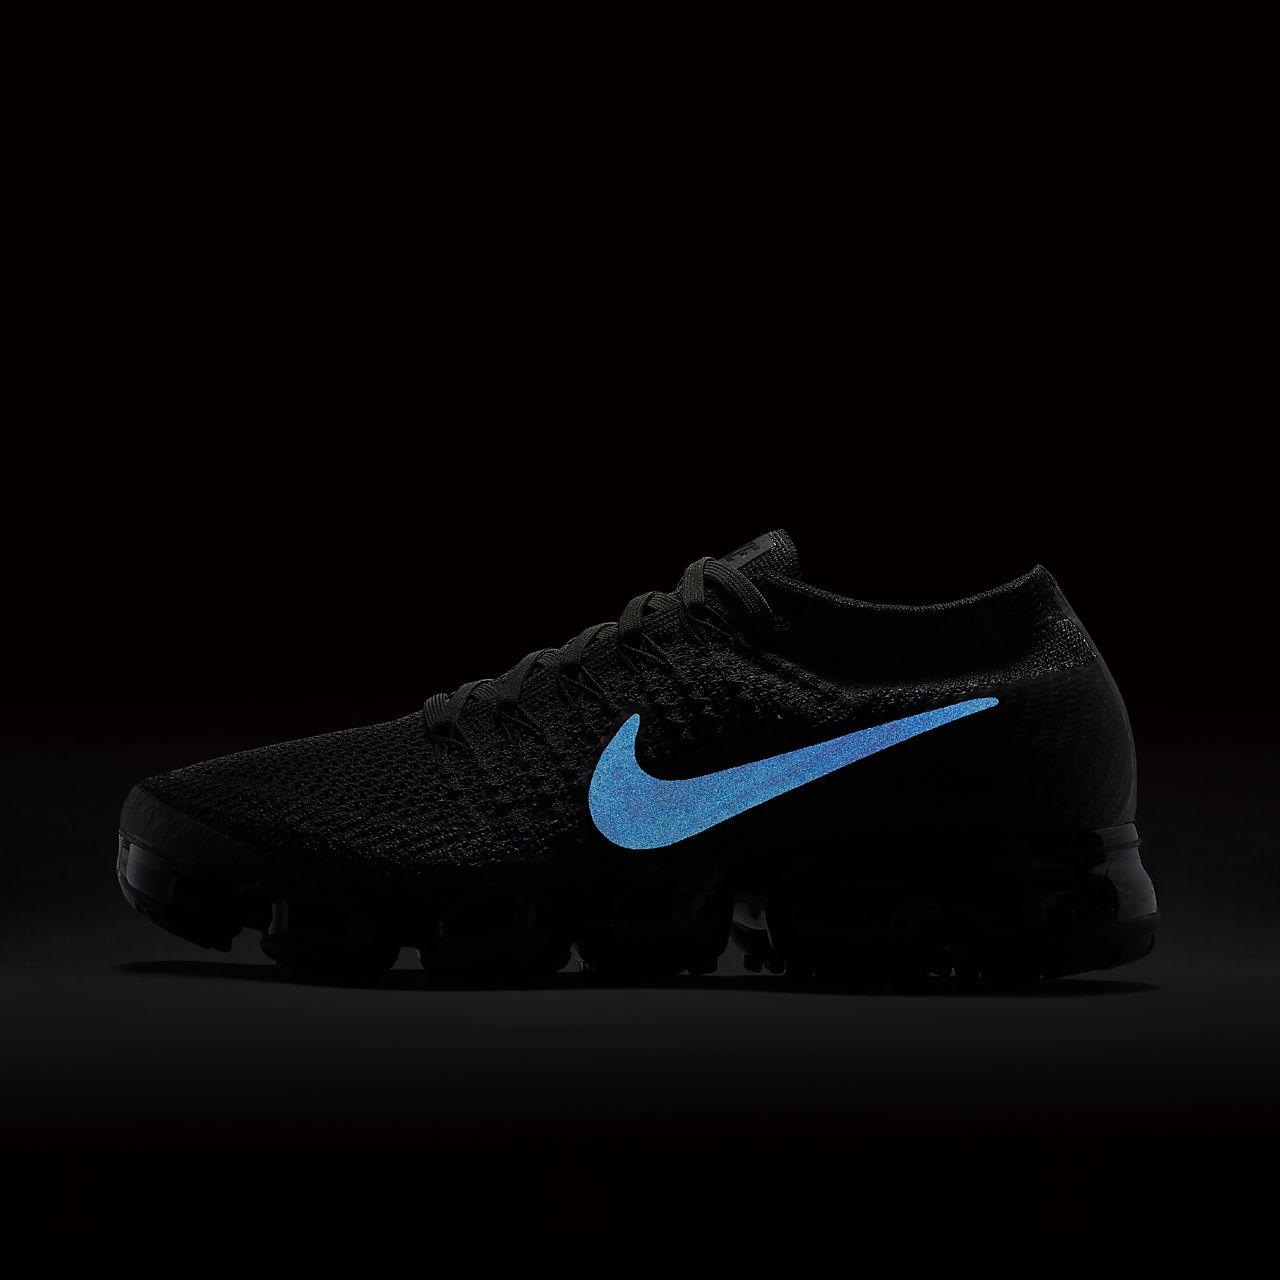 online store 0cf0f ca17c ... official store nike air vapormax flyknit womens running shoe cc174 78223